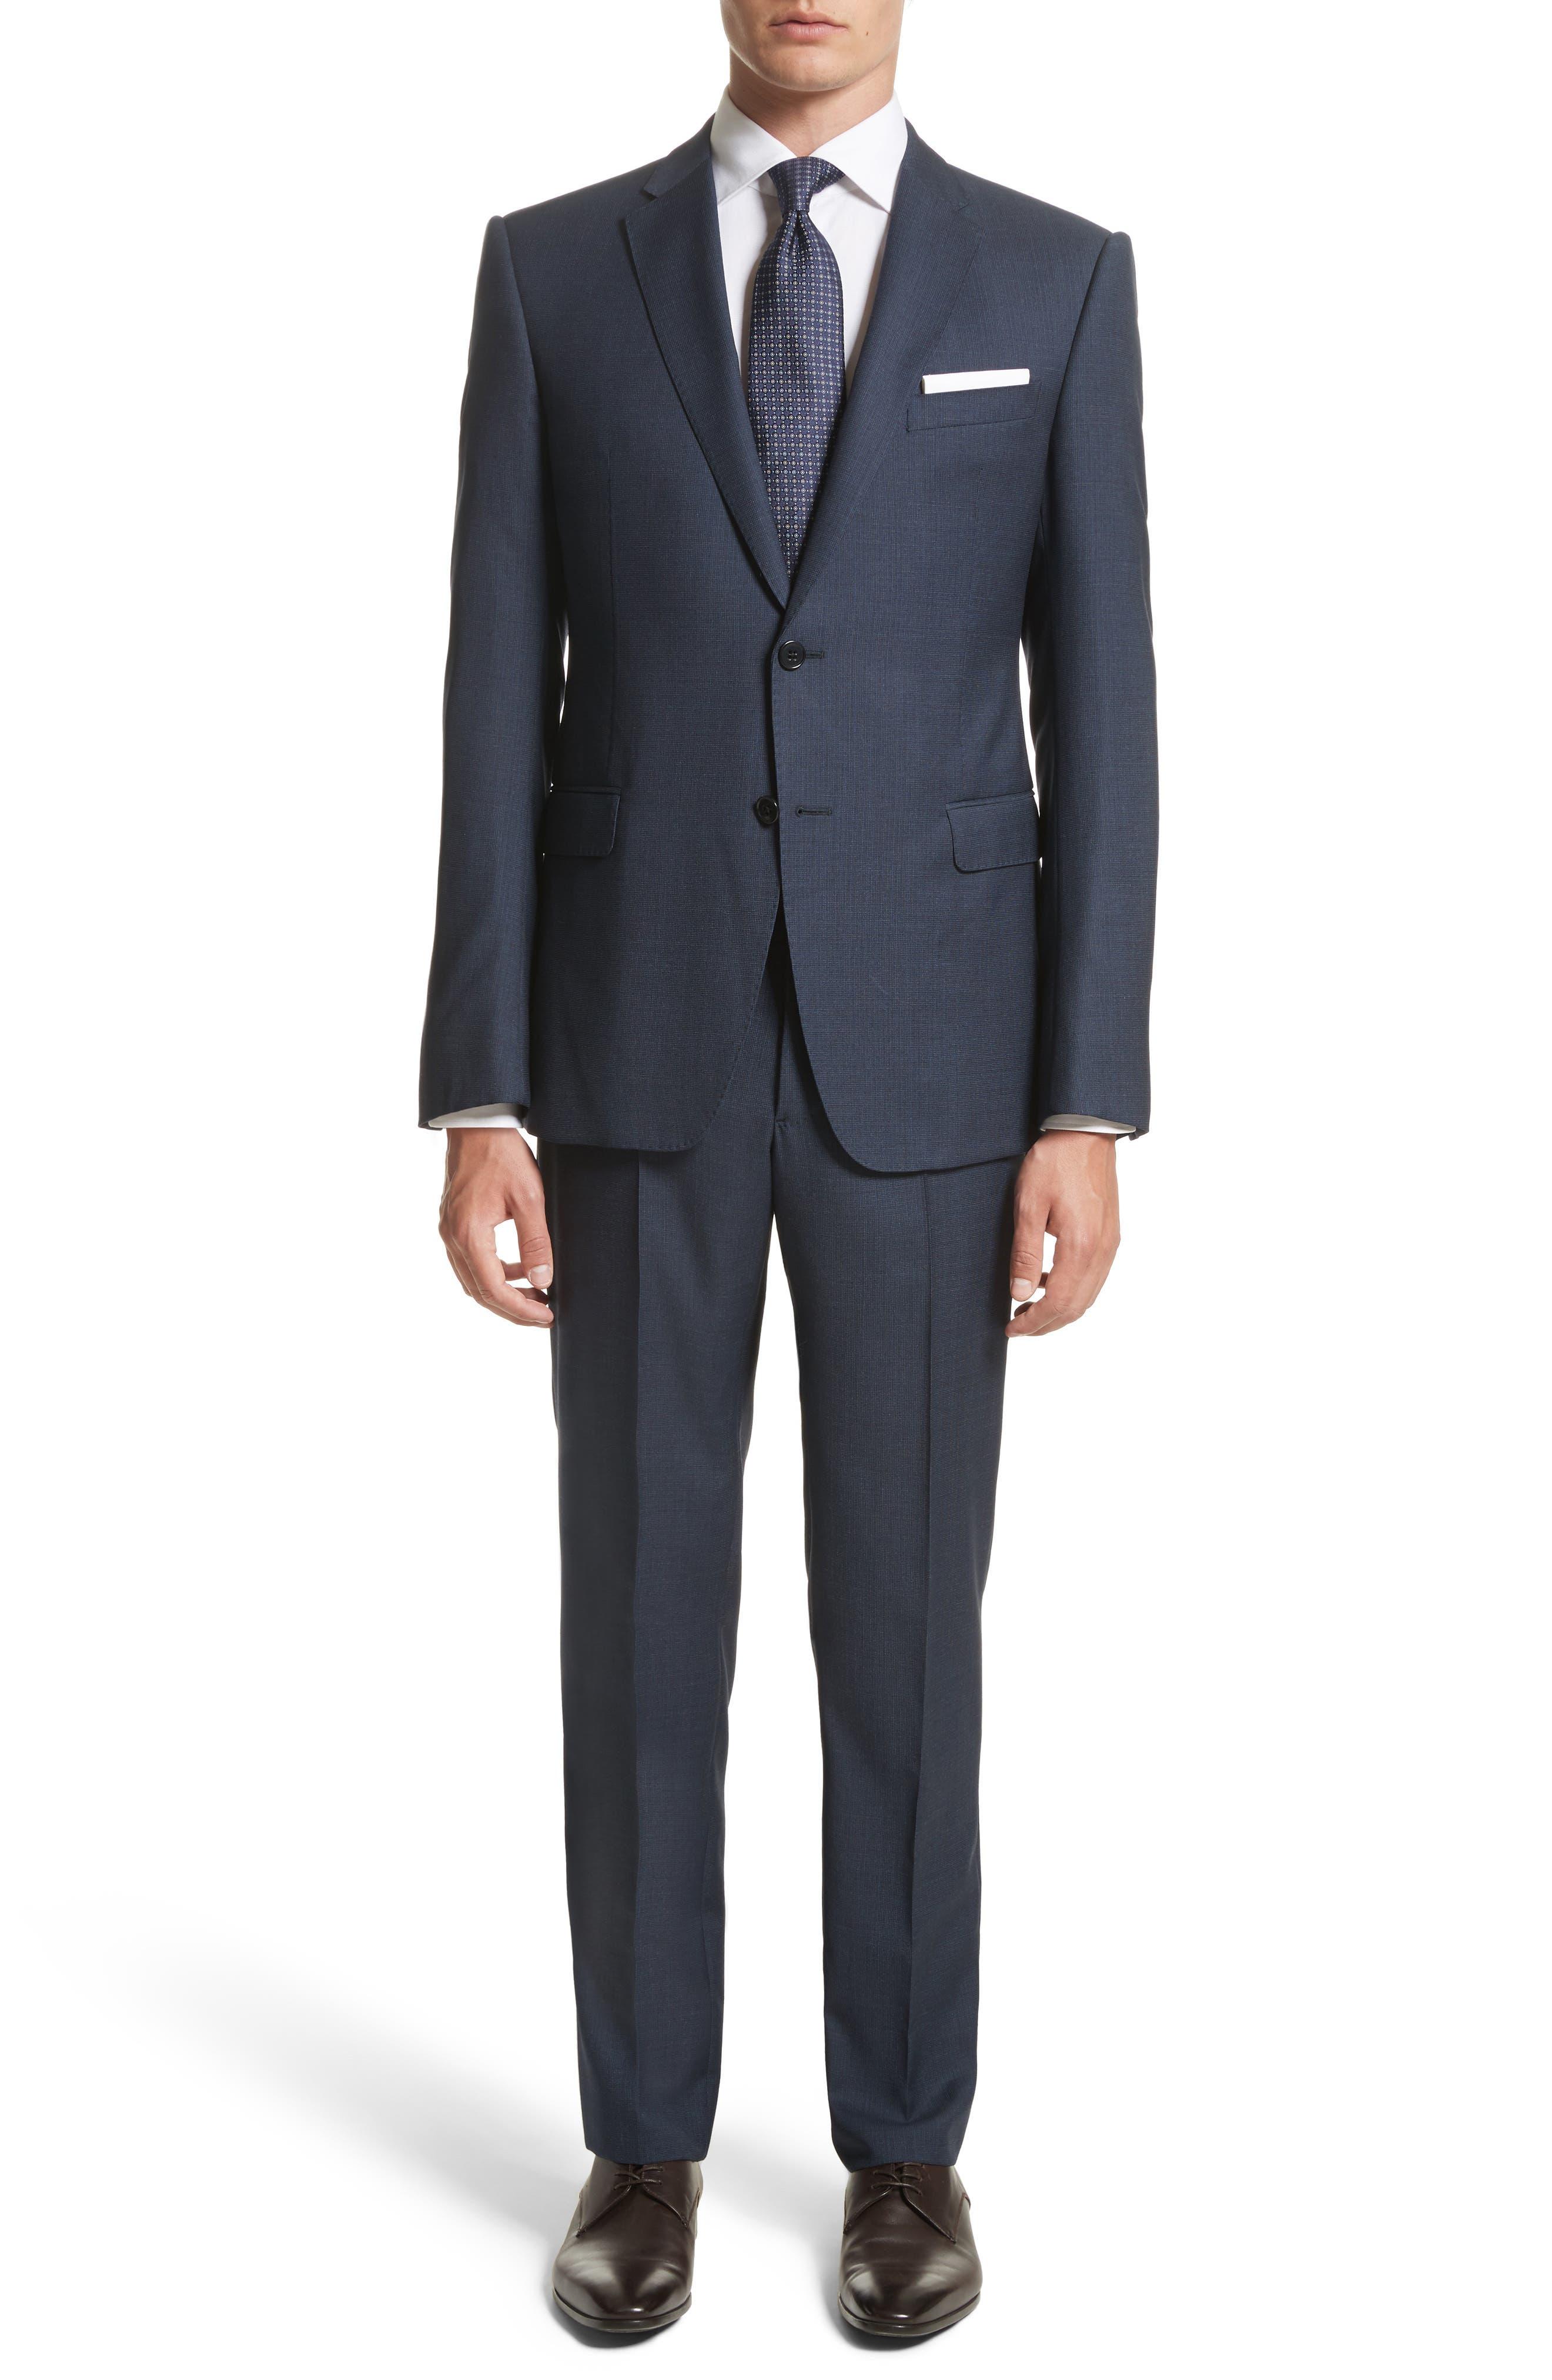 Main Image - Emporio Armani M-Line Trim Fit Solid Wool Suit